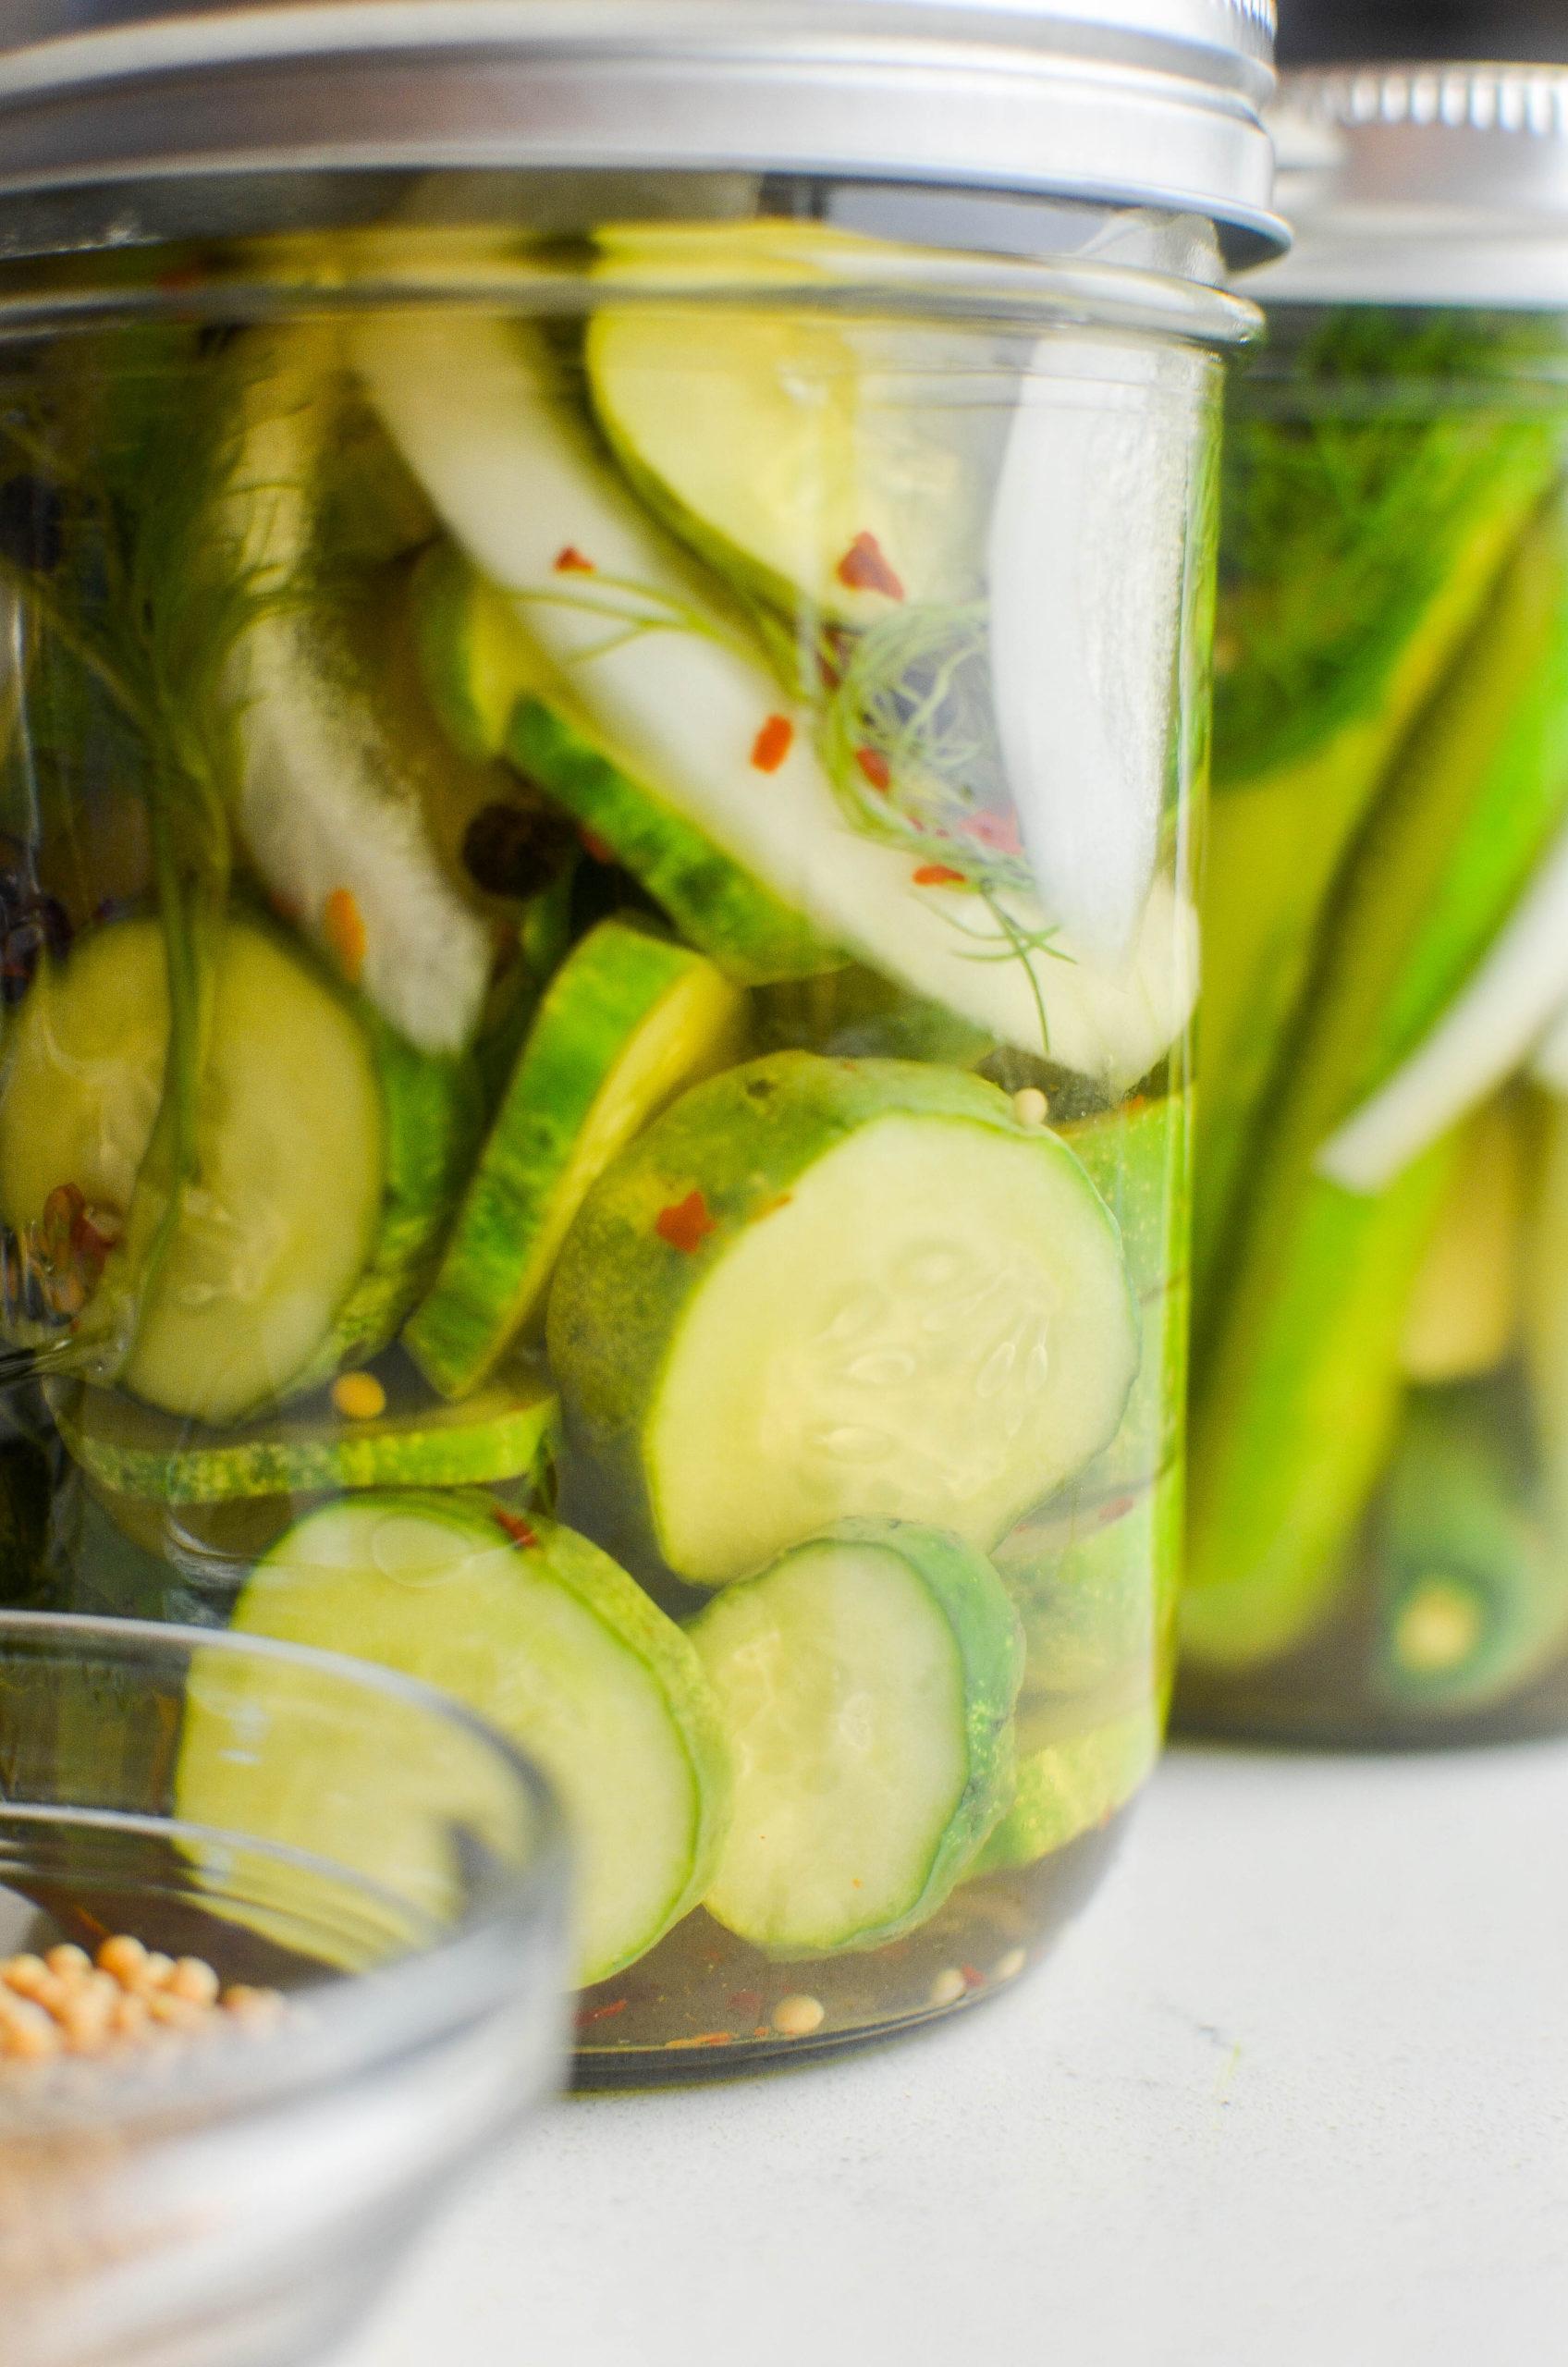 Refrigerator pickles in a glass jar.